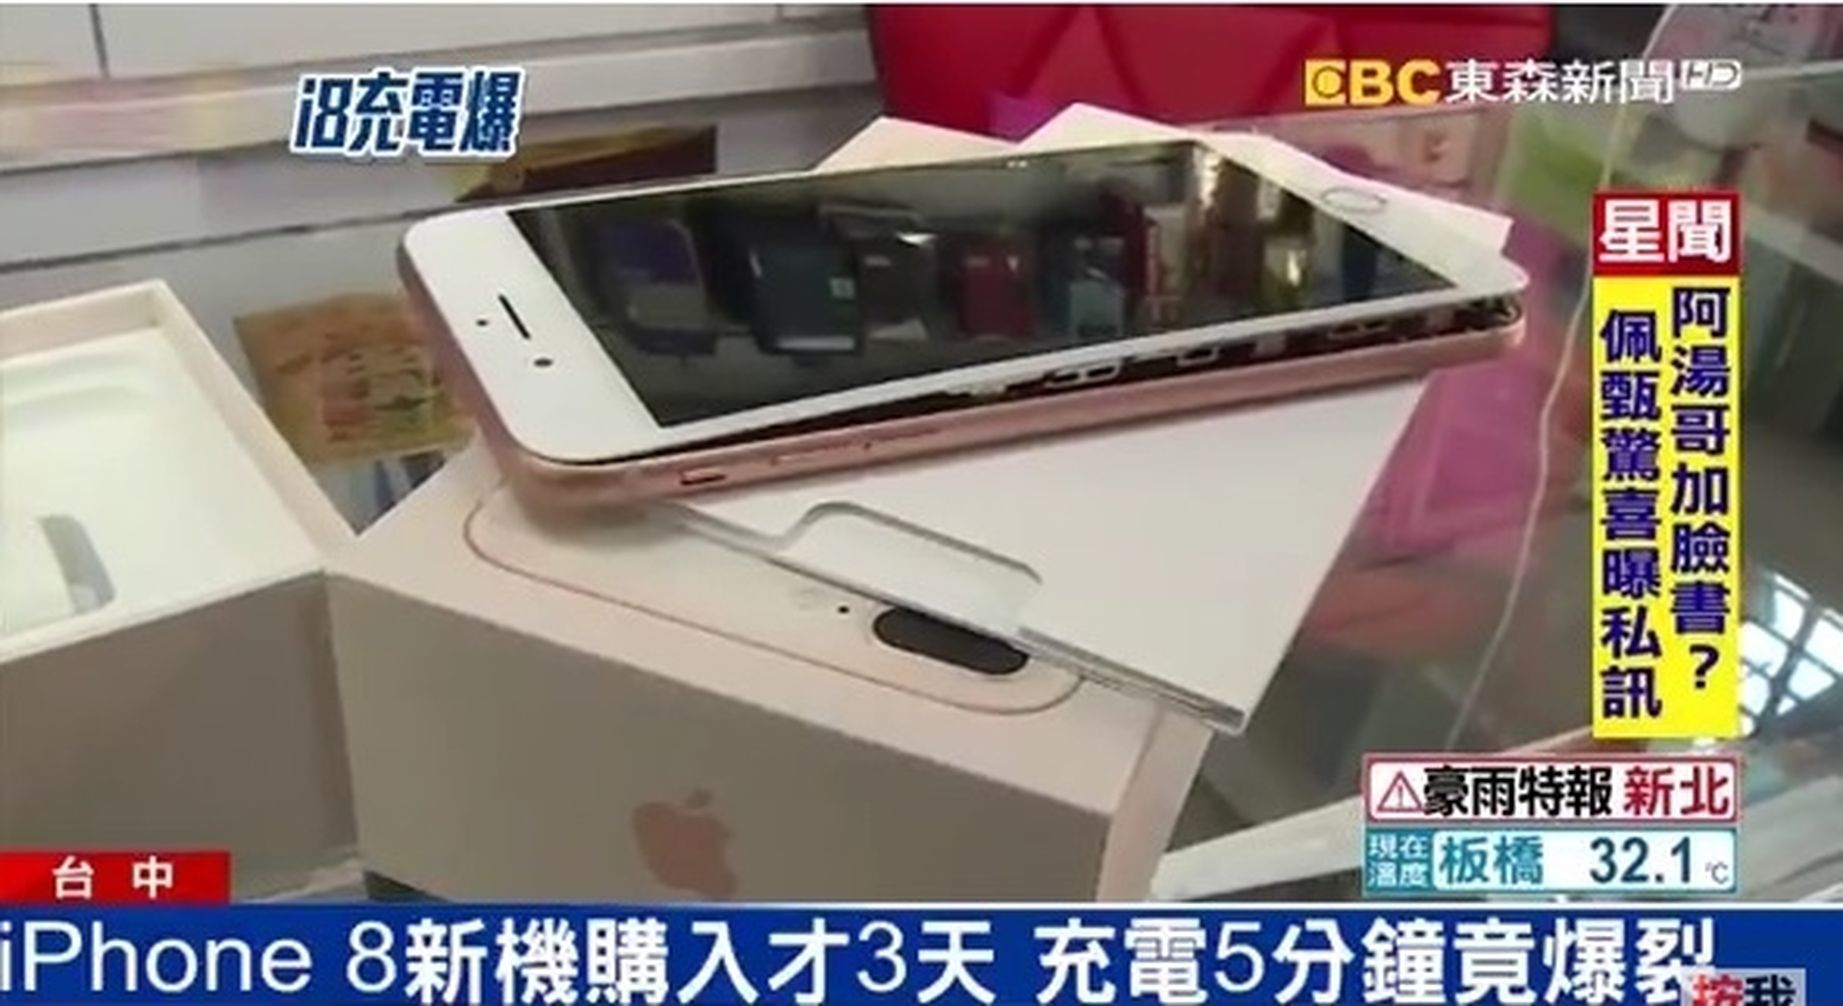 iPhone 8電池膨裂 傳蘋果證實 正在調查